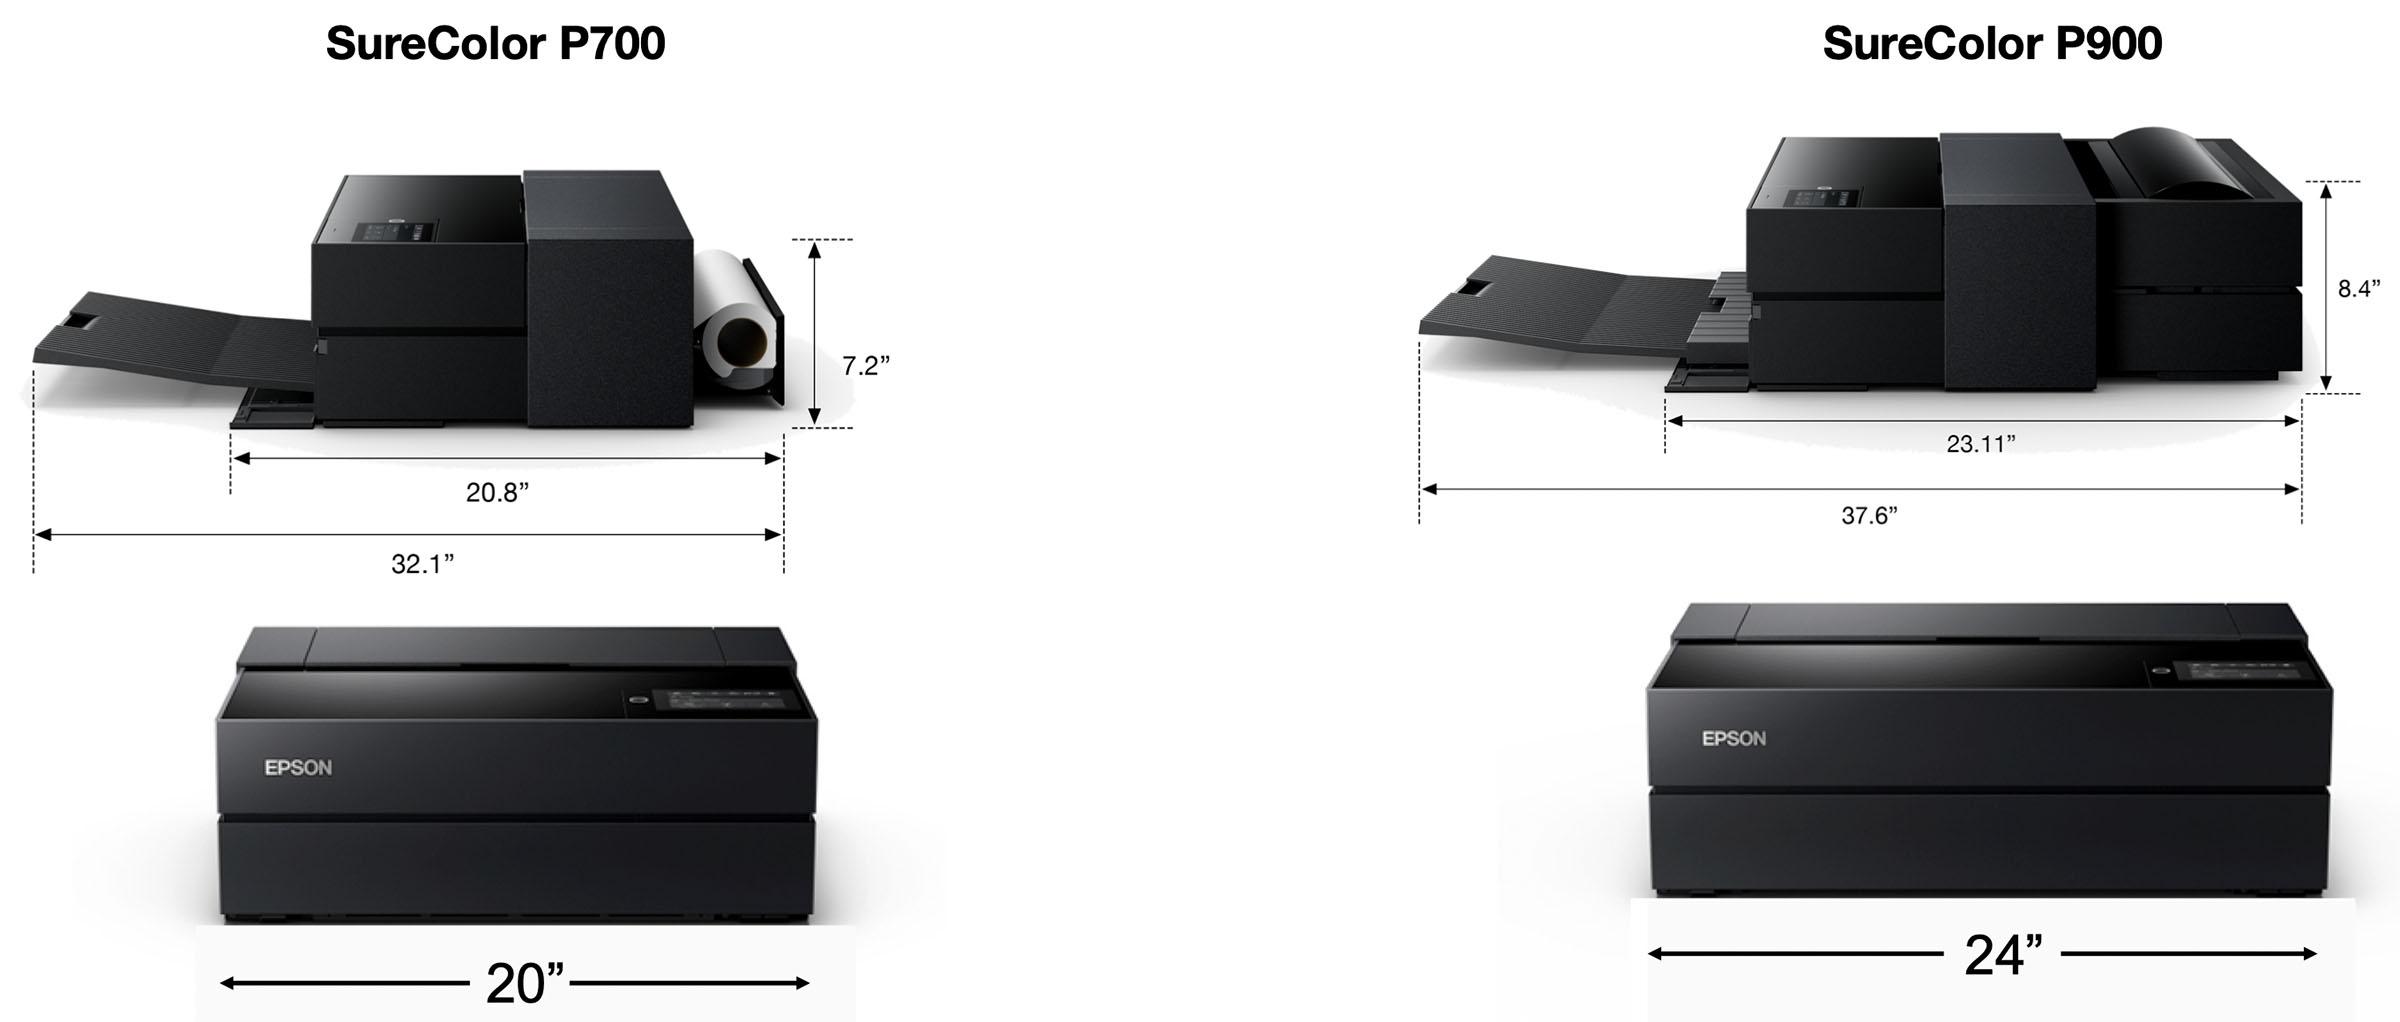 epson-p700-p900-size